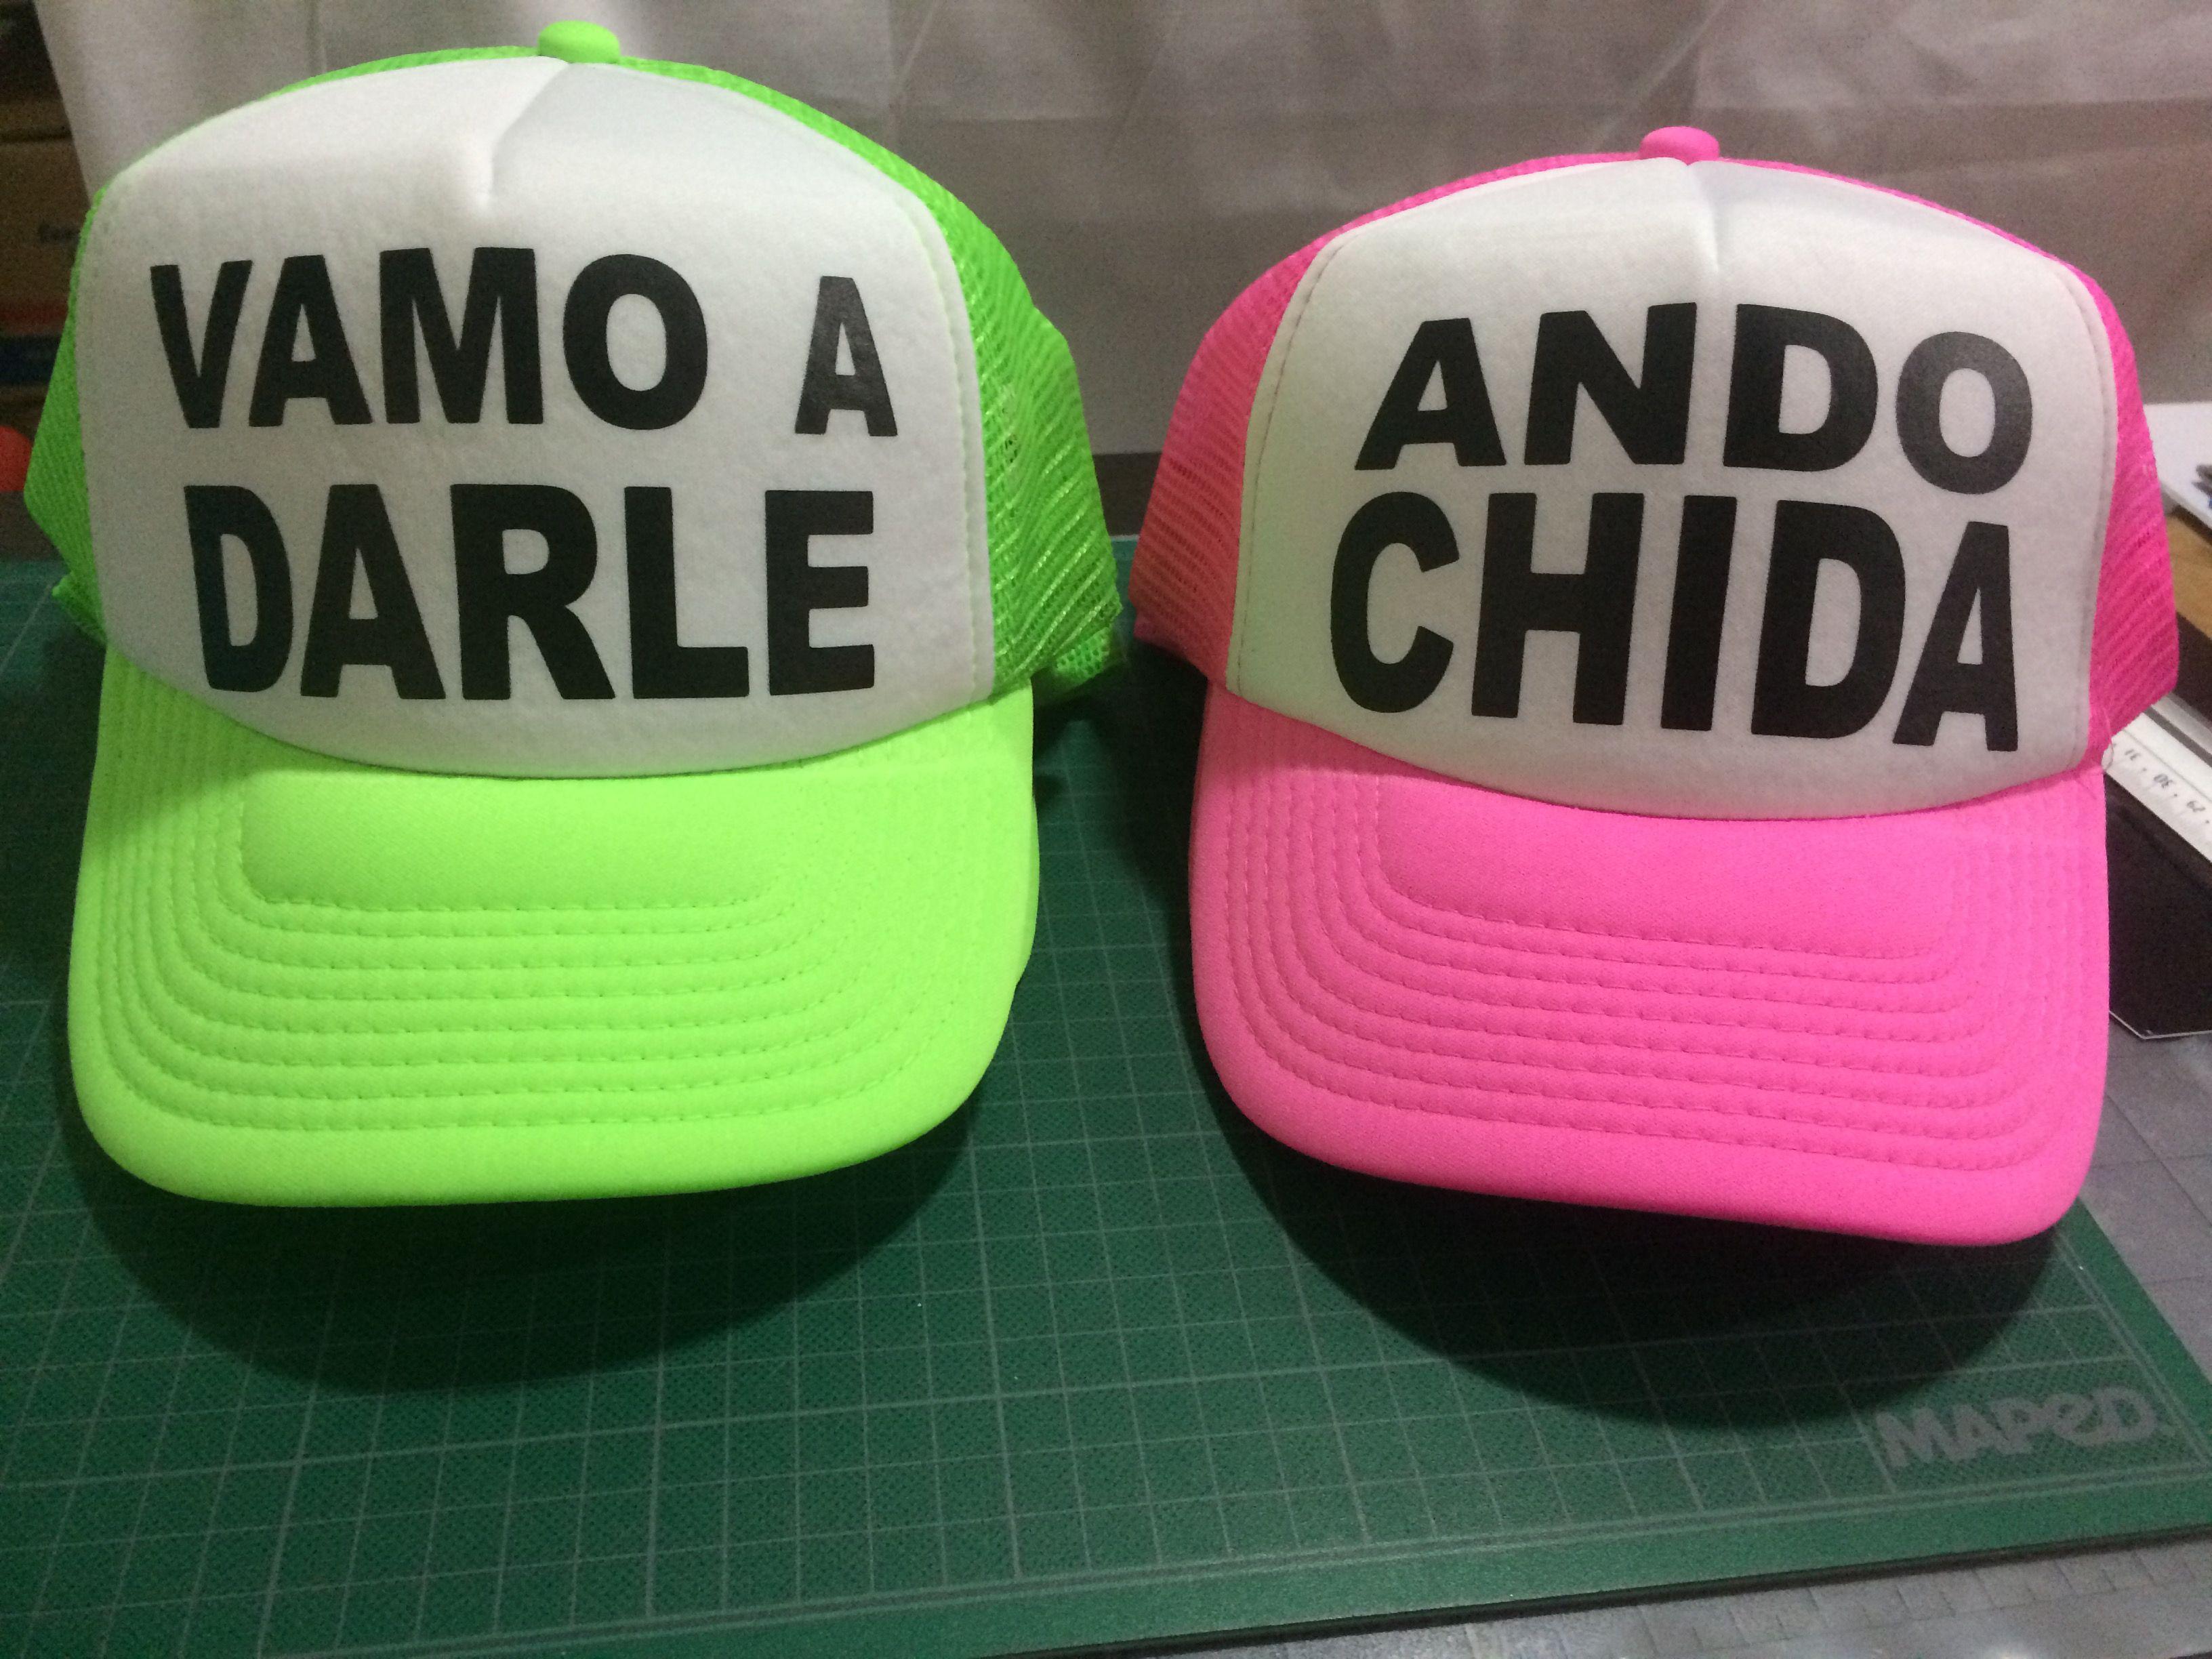 495eb80a4db1d Gorras personalizadas en color neón by Eatbrains! Campeche